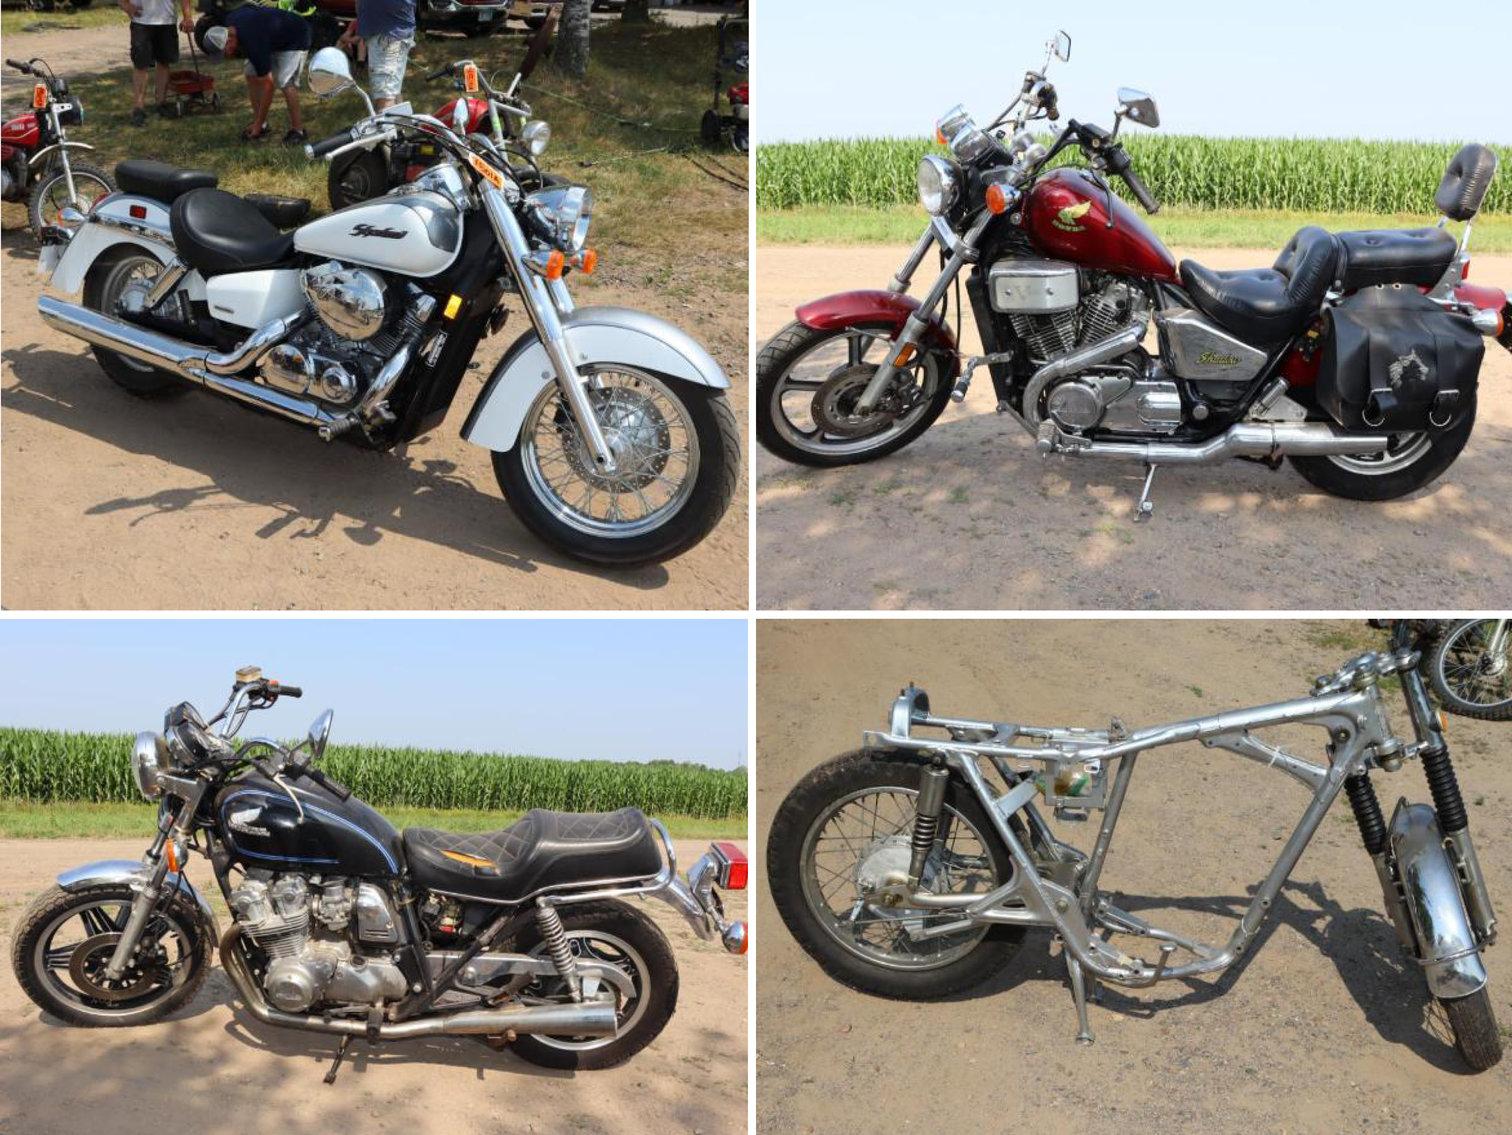 Lifetime Vintage Motorcycle Collection Phase 1: Honda, Kawasaki, Suzuki, Yamaha, Harley, Plus Motorcycle Parts and Accessories